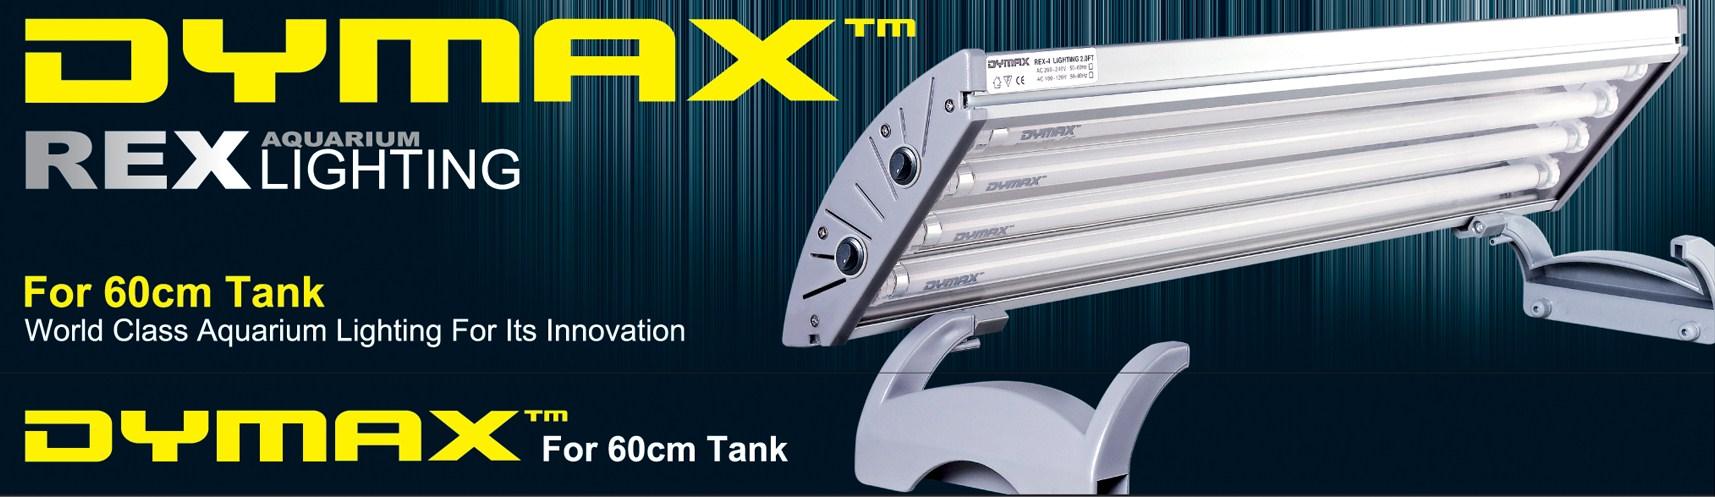 Dymax Luminária T5 Rex-4 (4X 21W) 90cm 110V